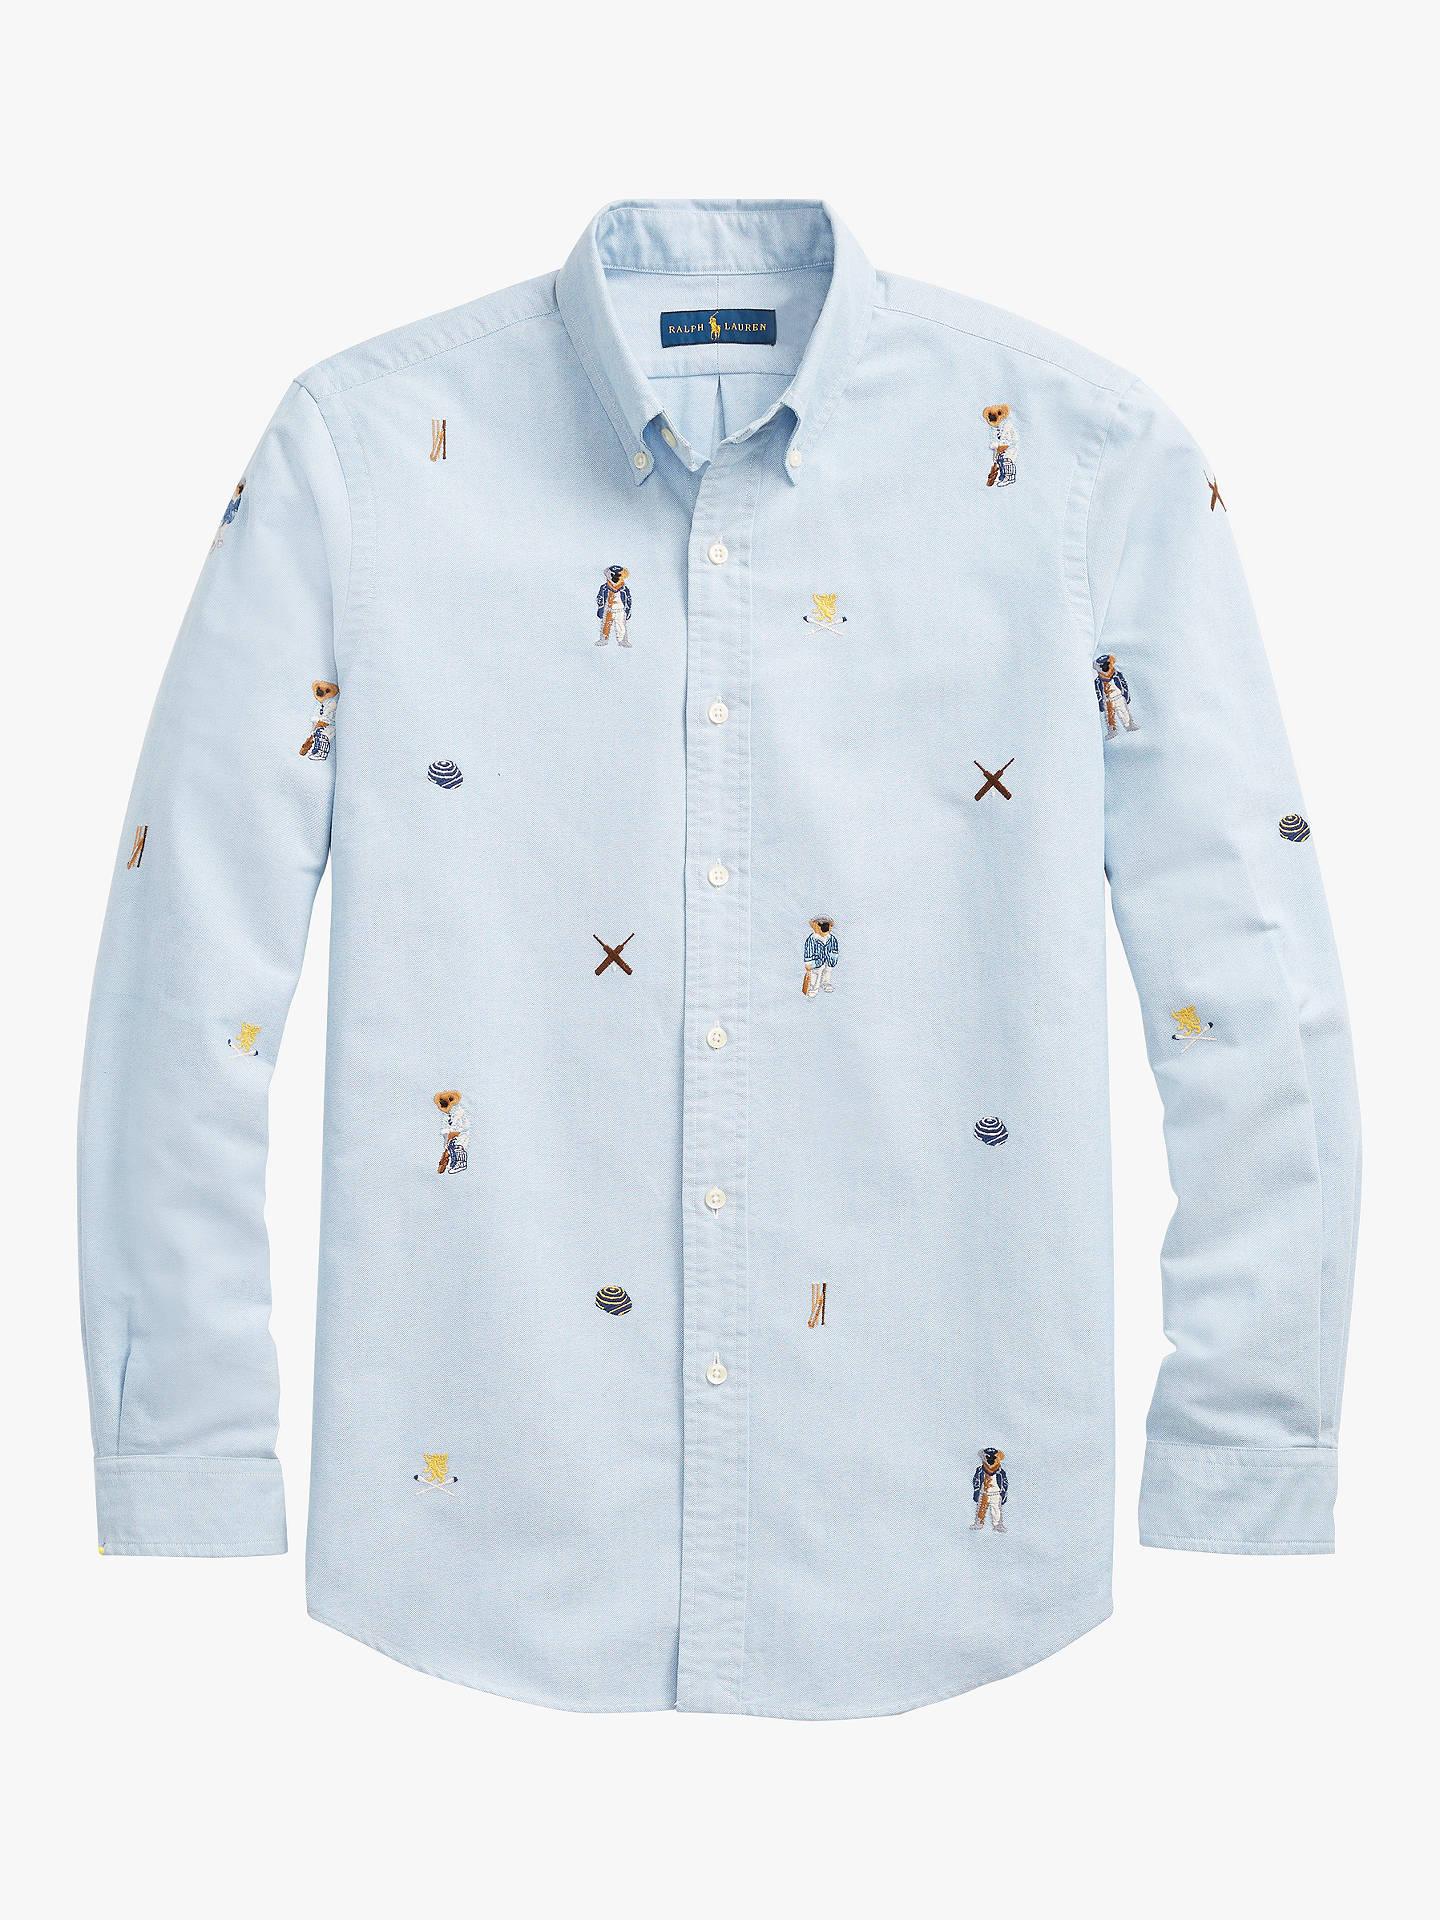 7cab72057 ... Buy Polo Ralph Lauren Cricket Bear Shirt